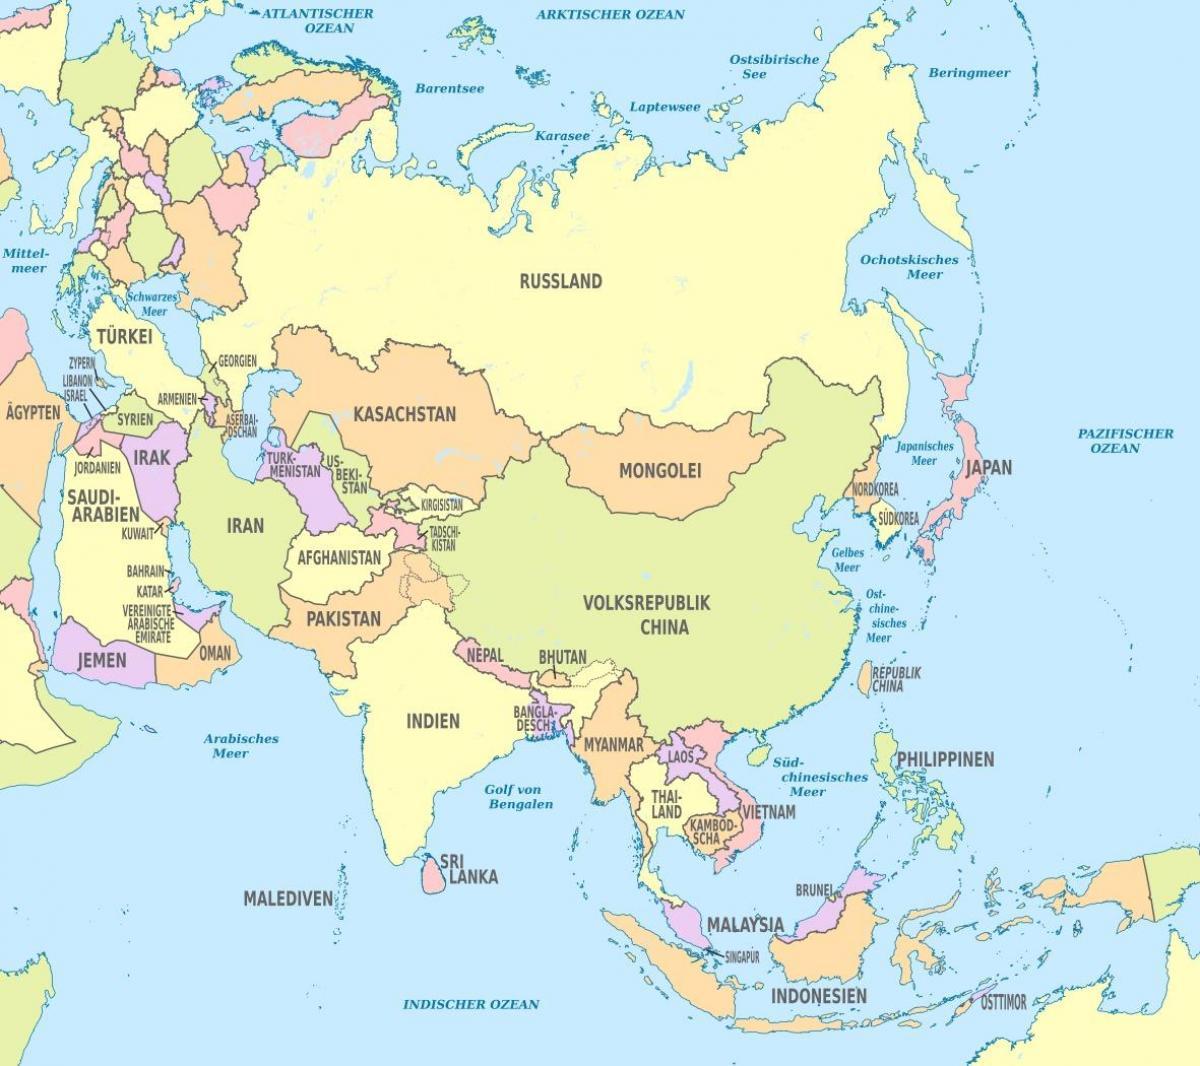 Bahrain Asien Kort Kort Over Bahrain Asien Det Vestlige Asien